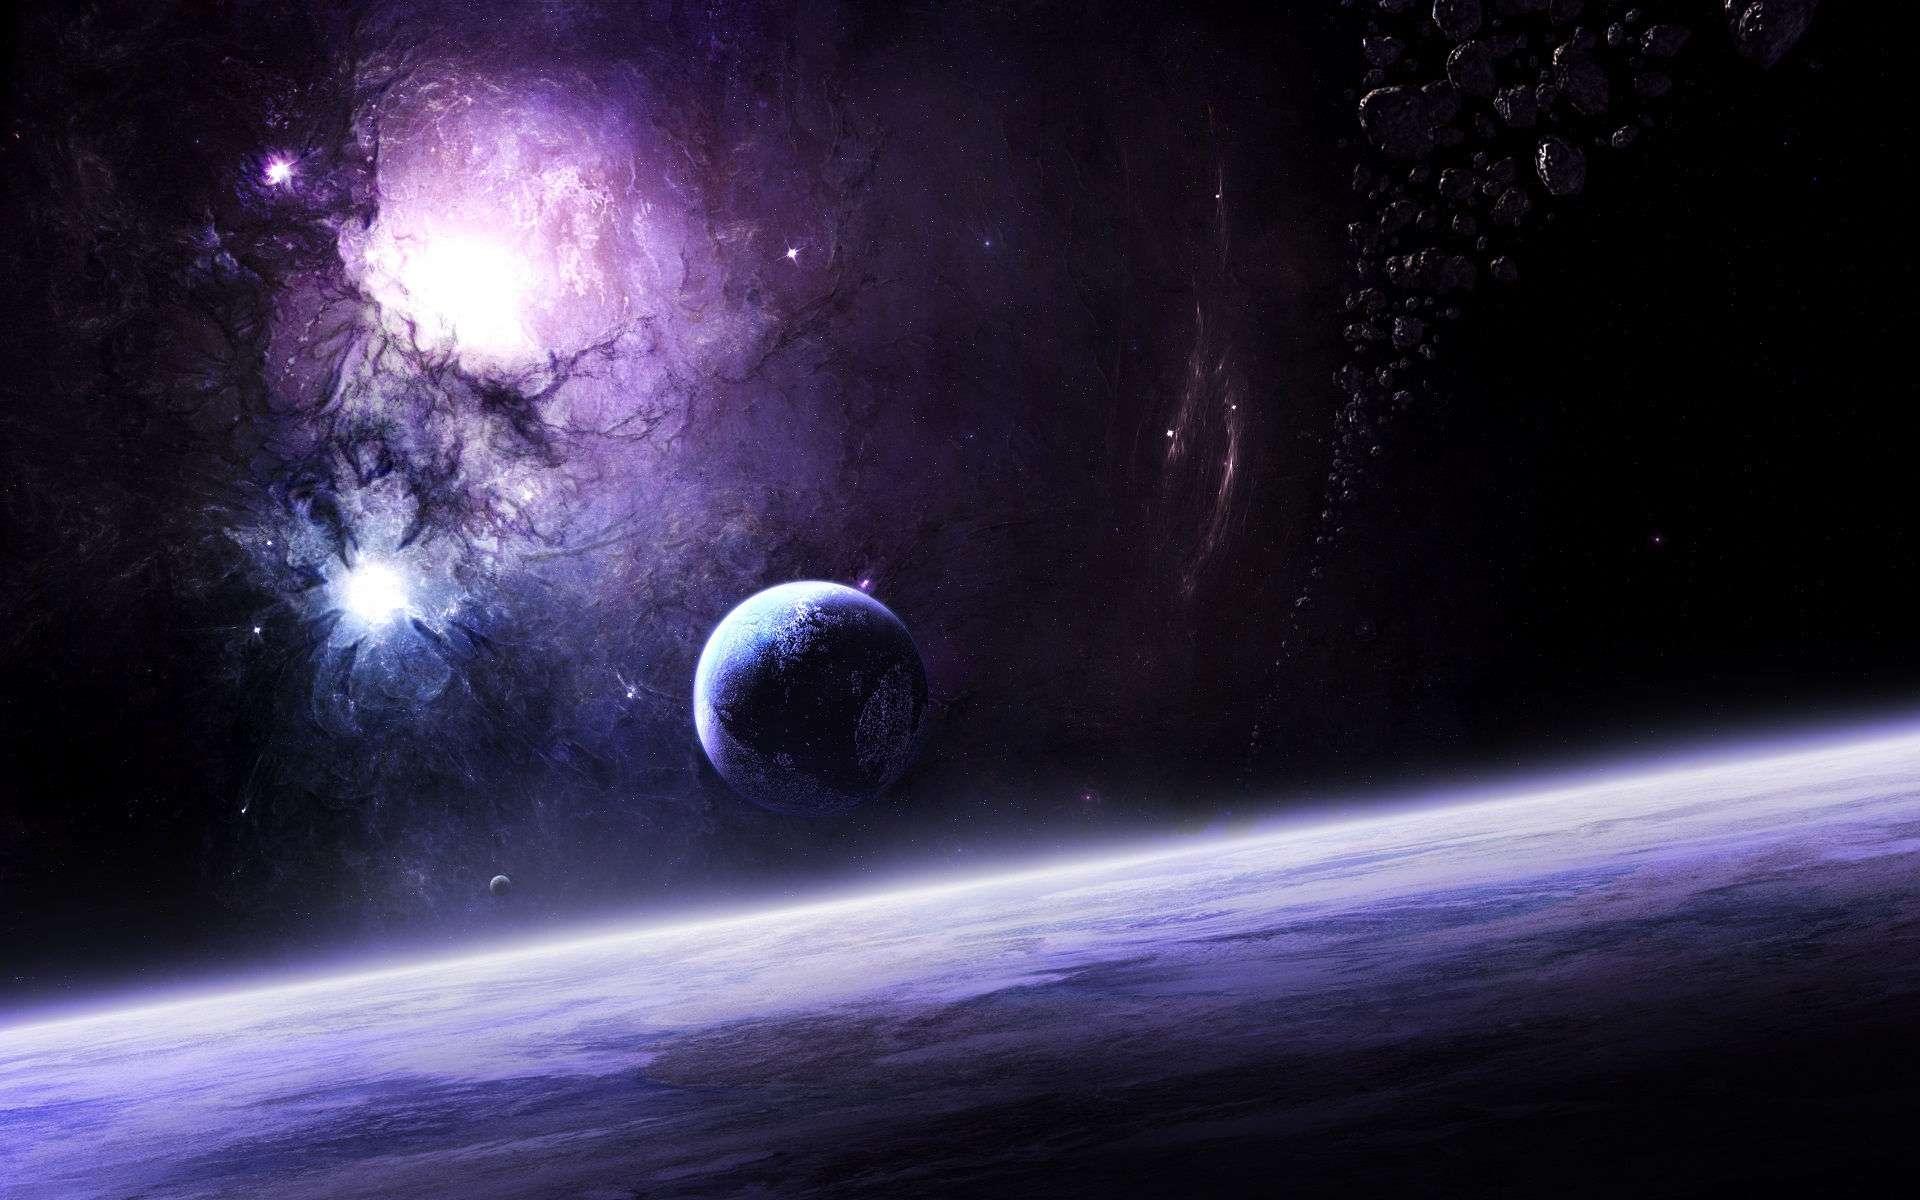 Space Wallpaper 013